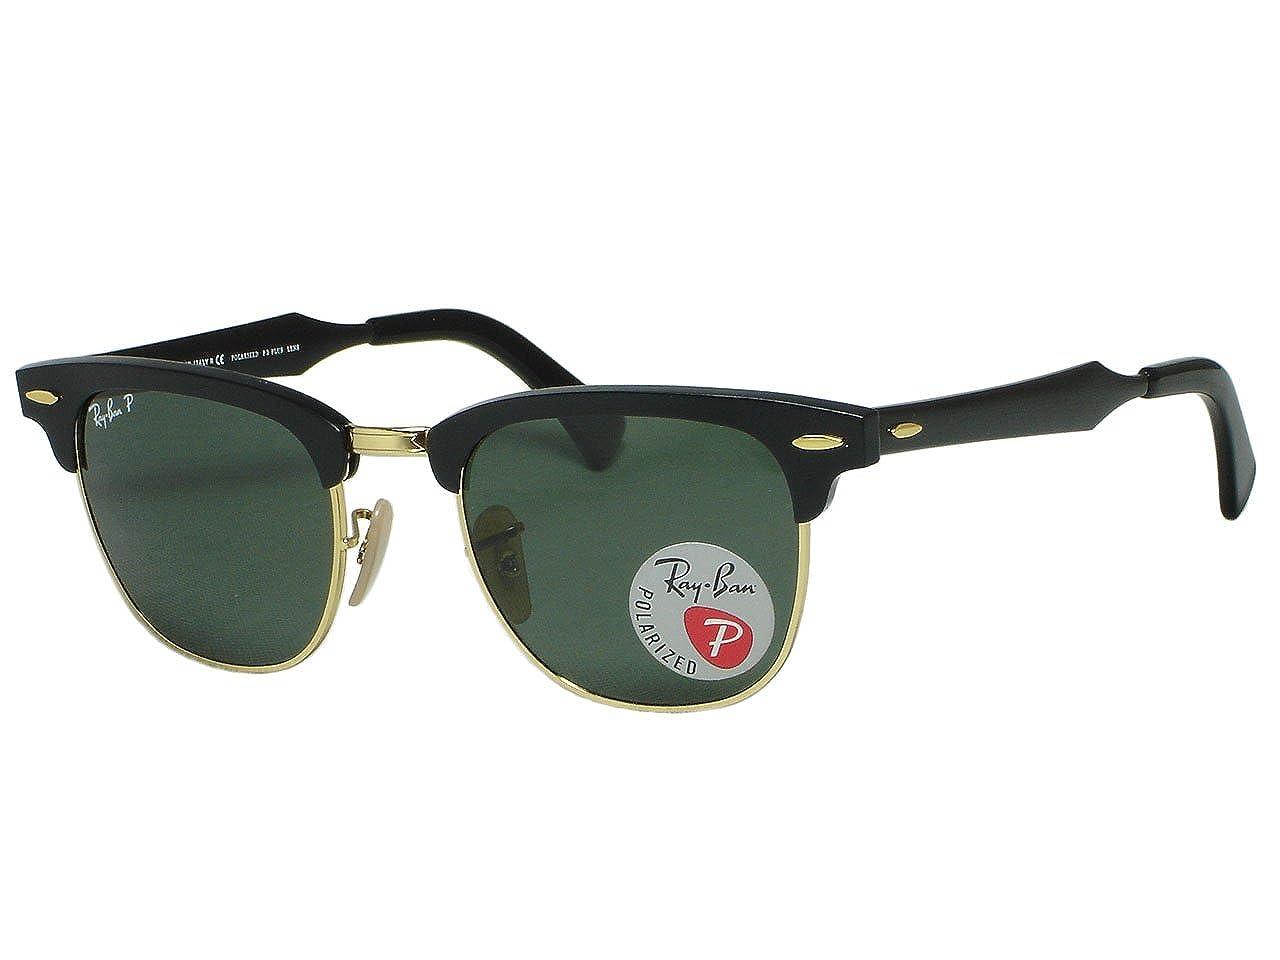 24d0d43c29 Amazon.com  Ray-Ban Clubmaster Aluminum 0RB3507 Sunglasses  Clothing